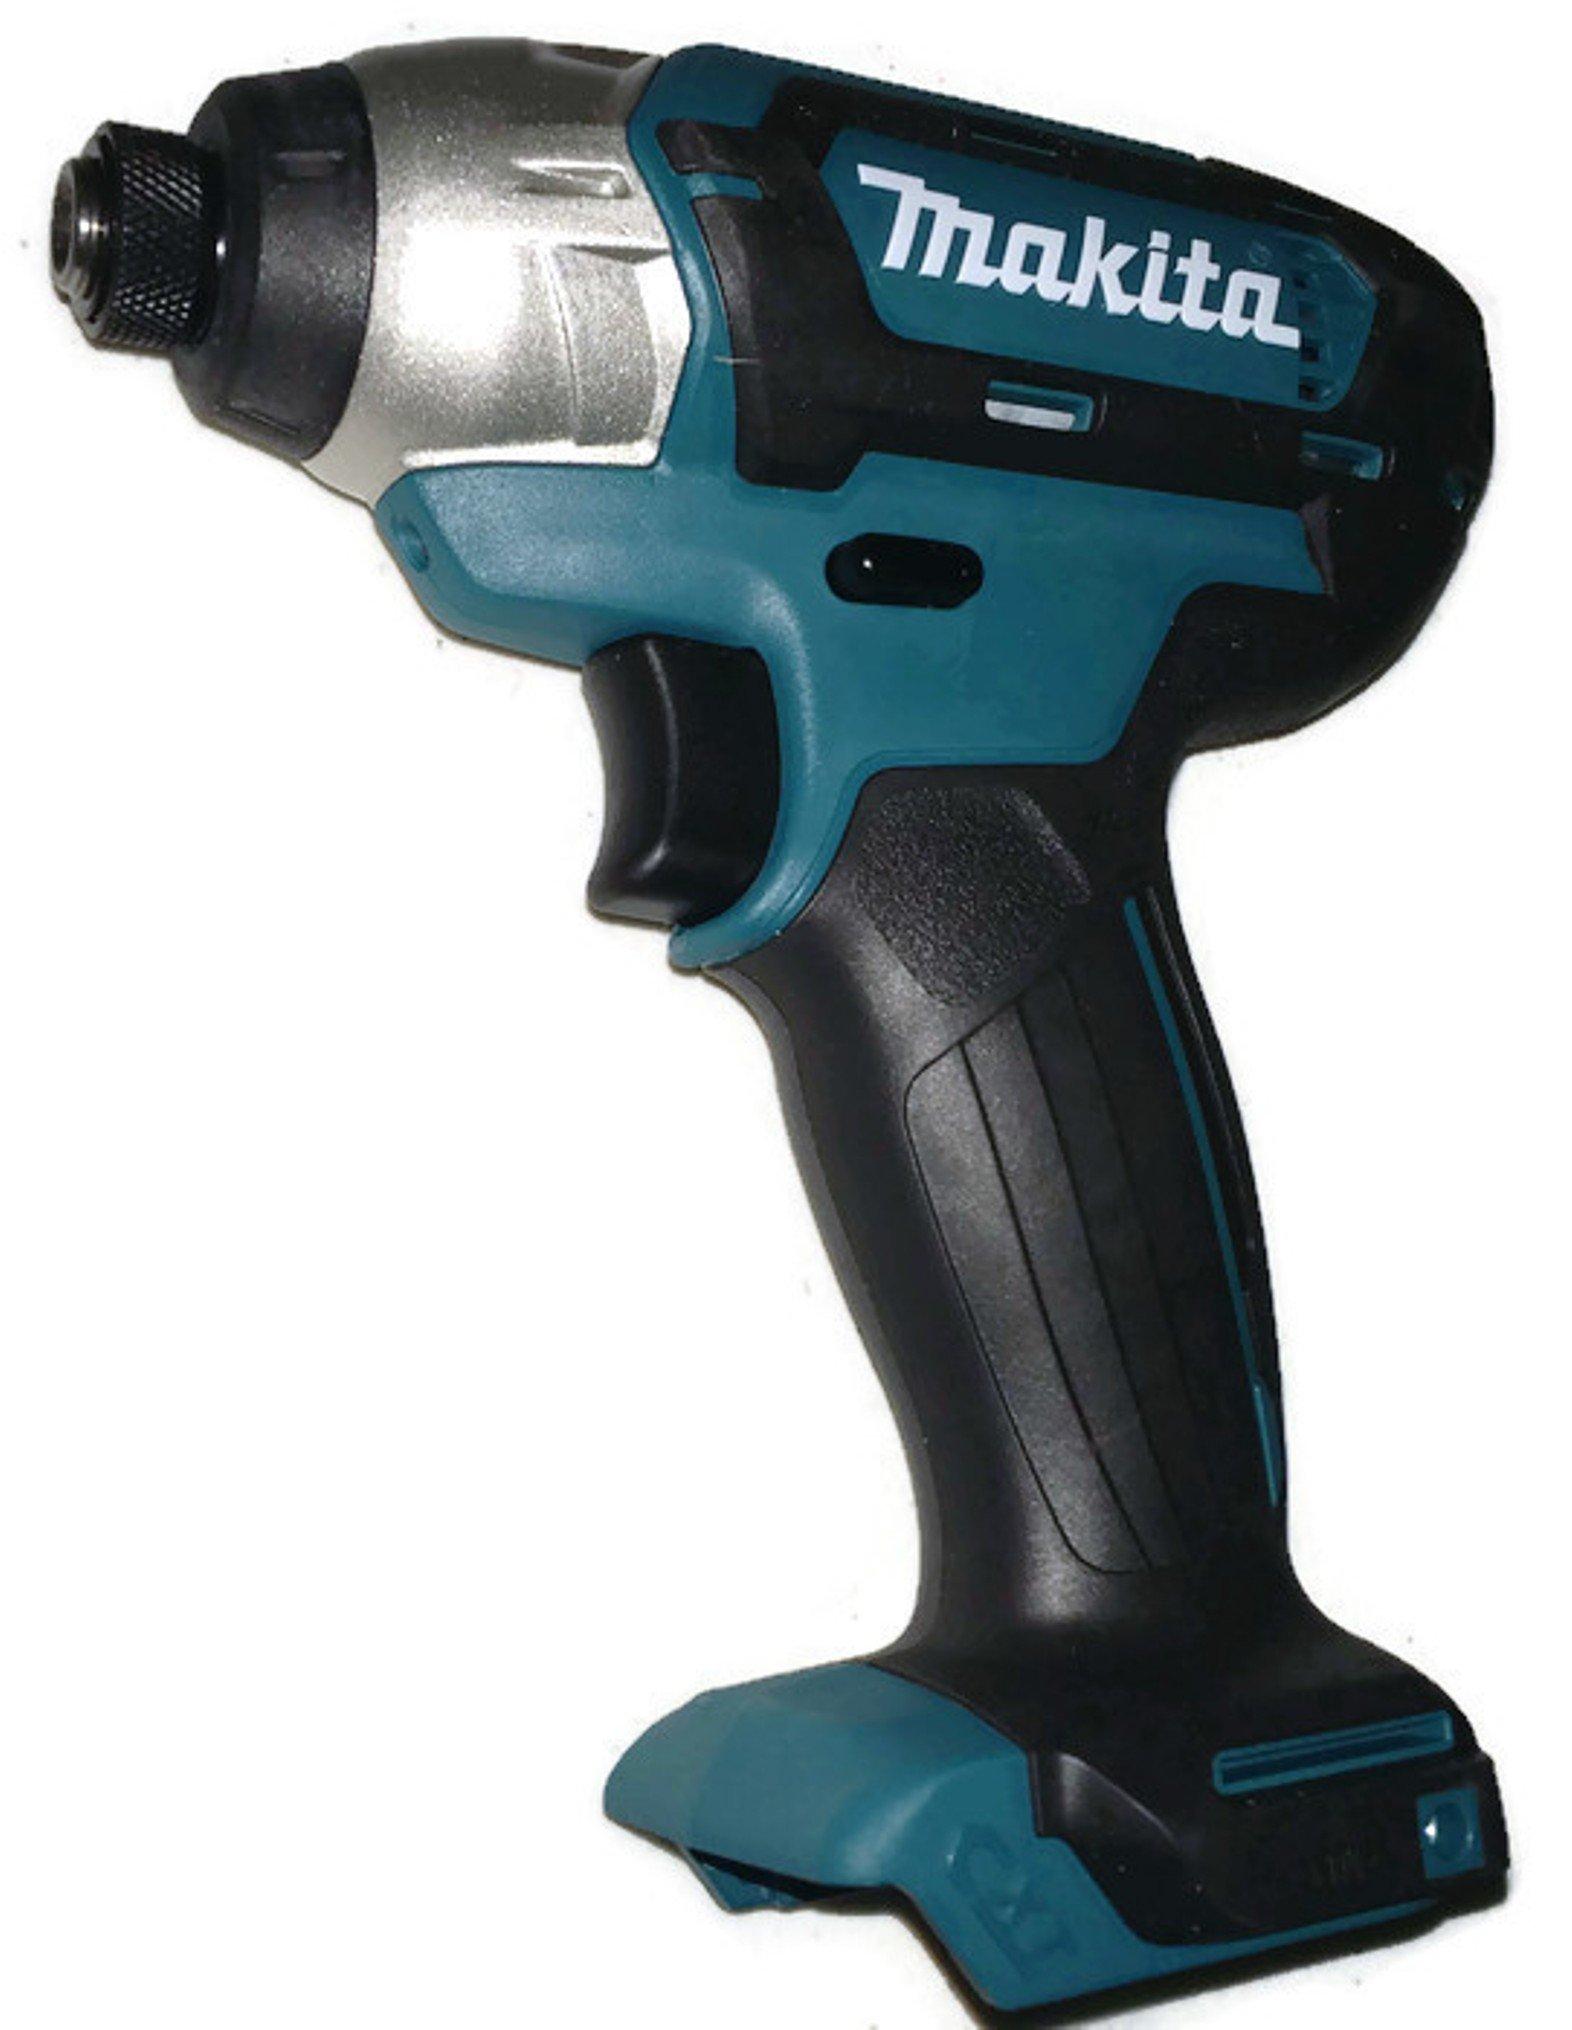 Makita DT03 12V CXT Impact Driver (Bare Tool)